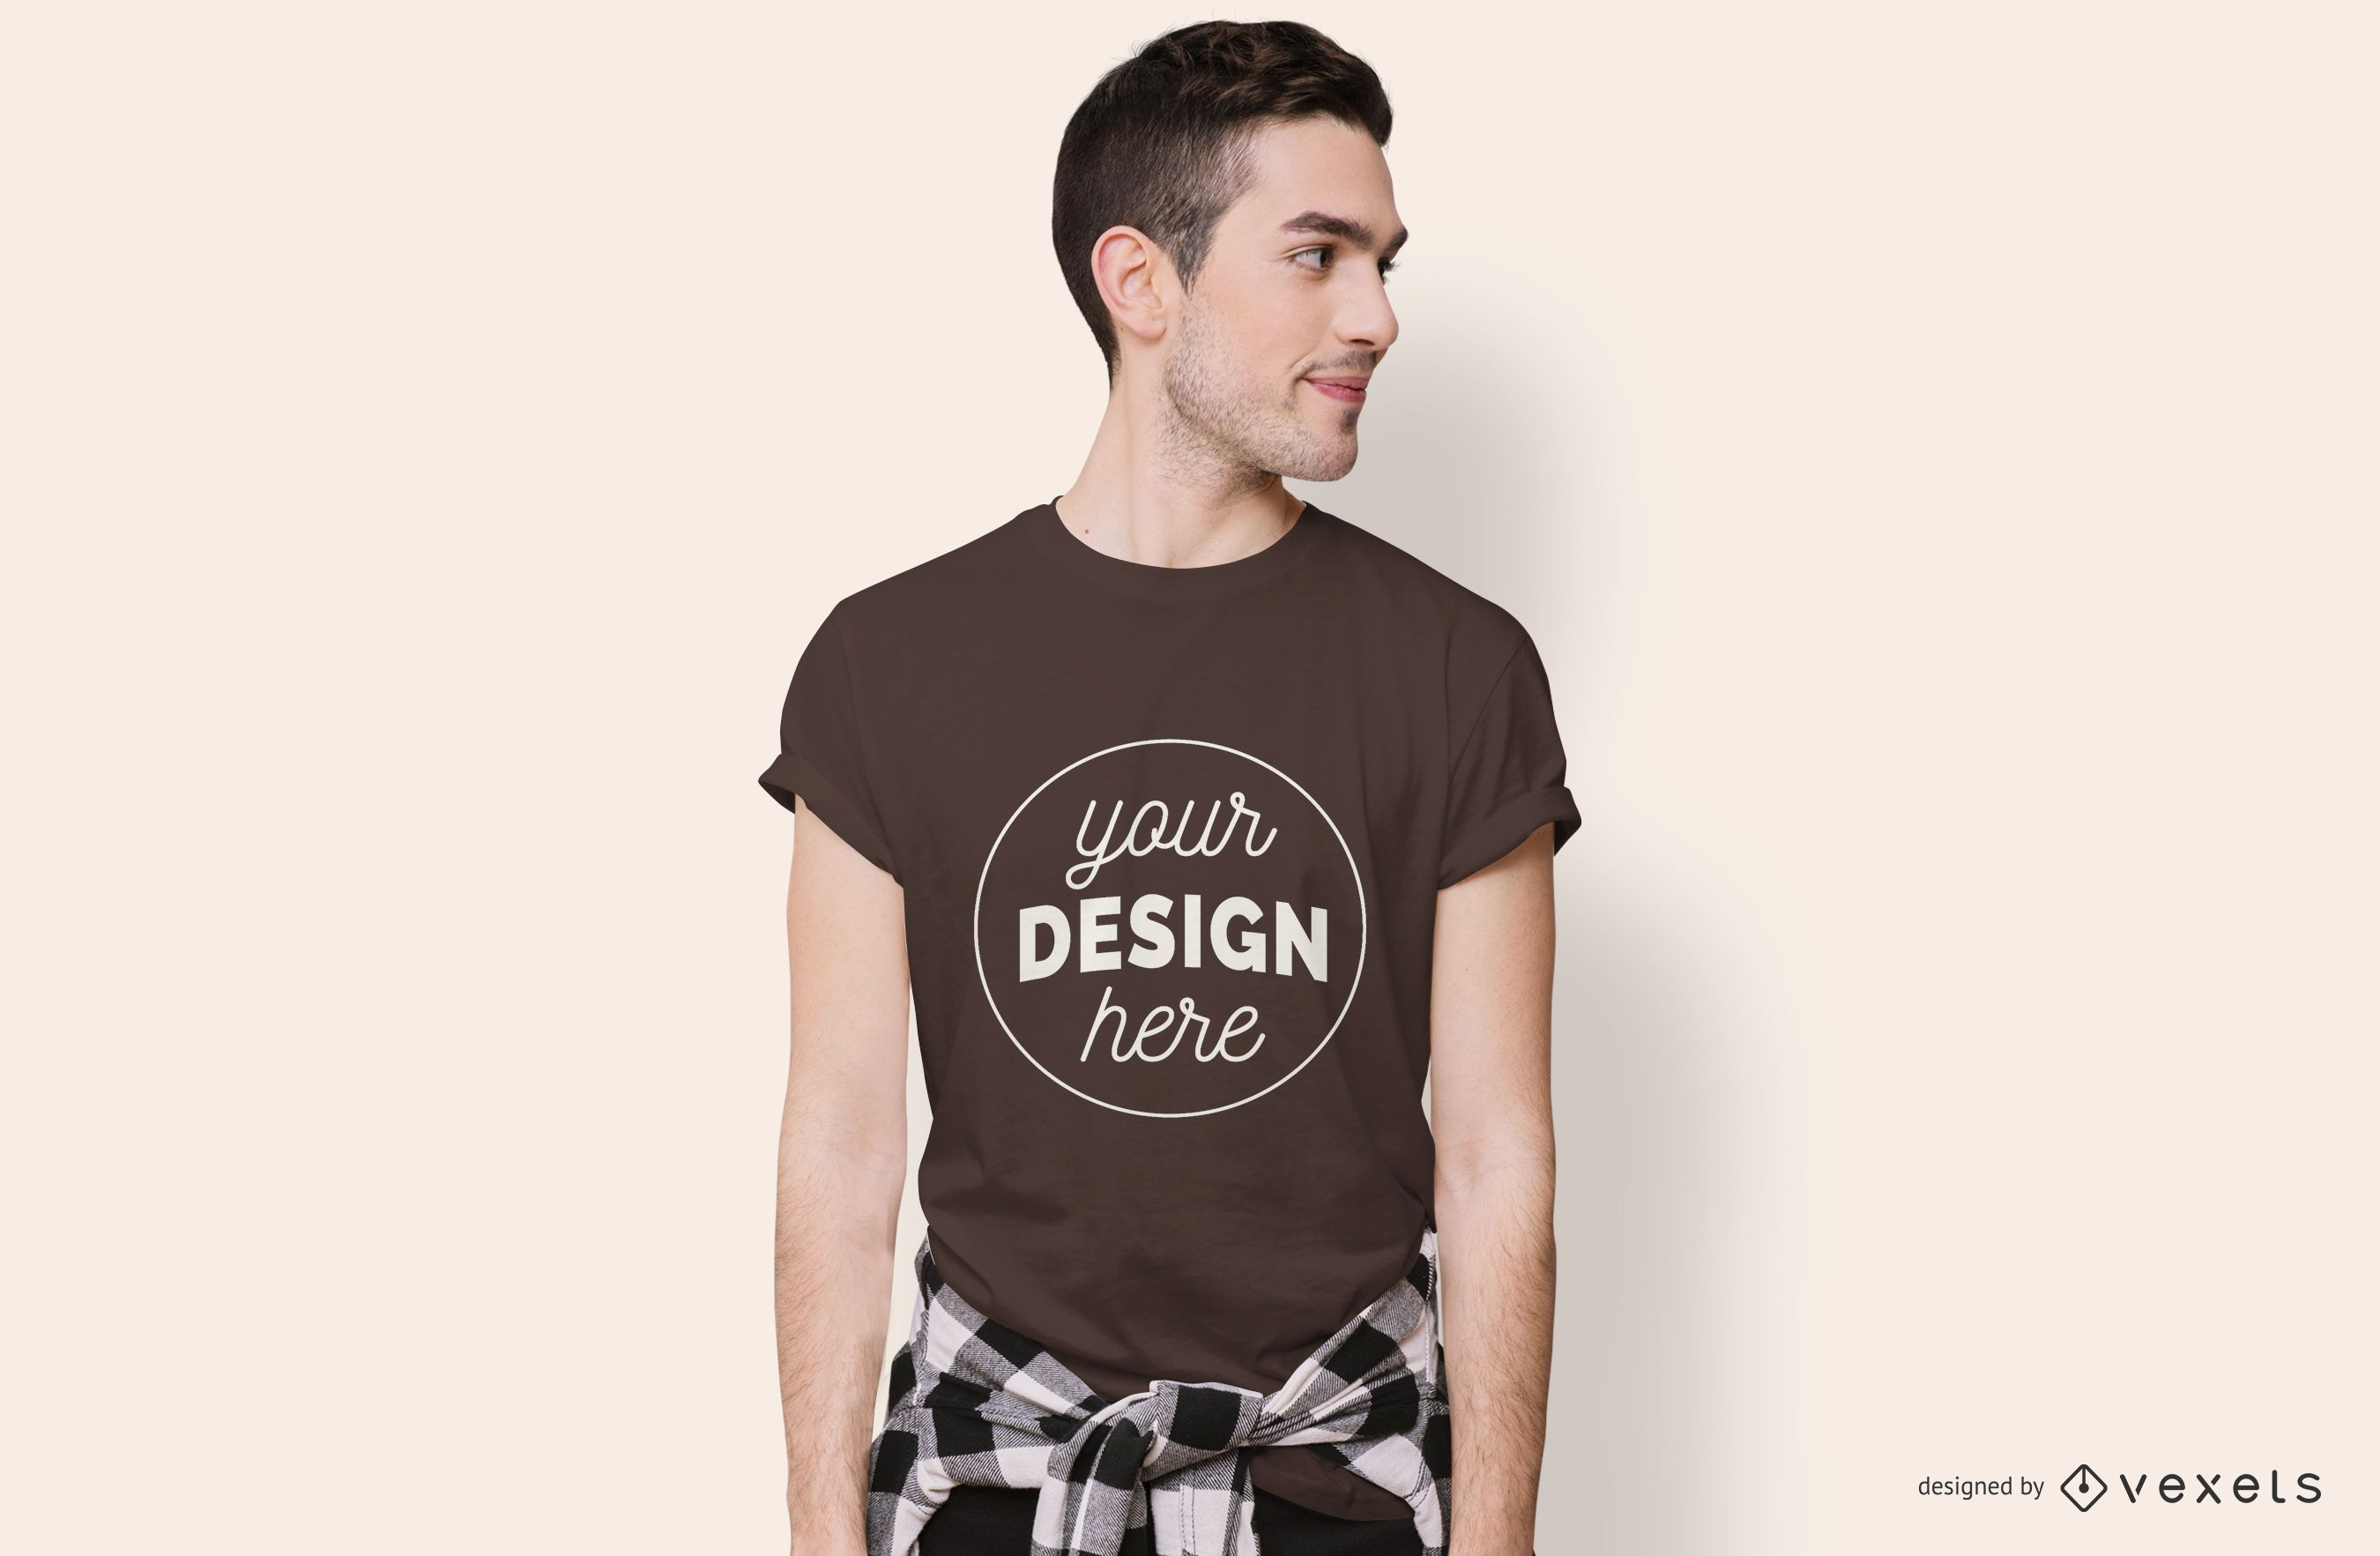 Boy Looking Sideways T-shirt Mockup